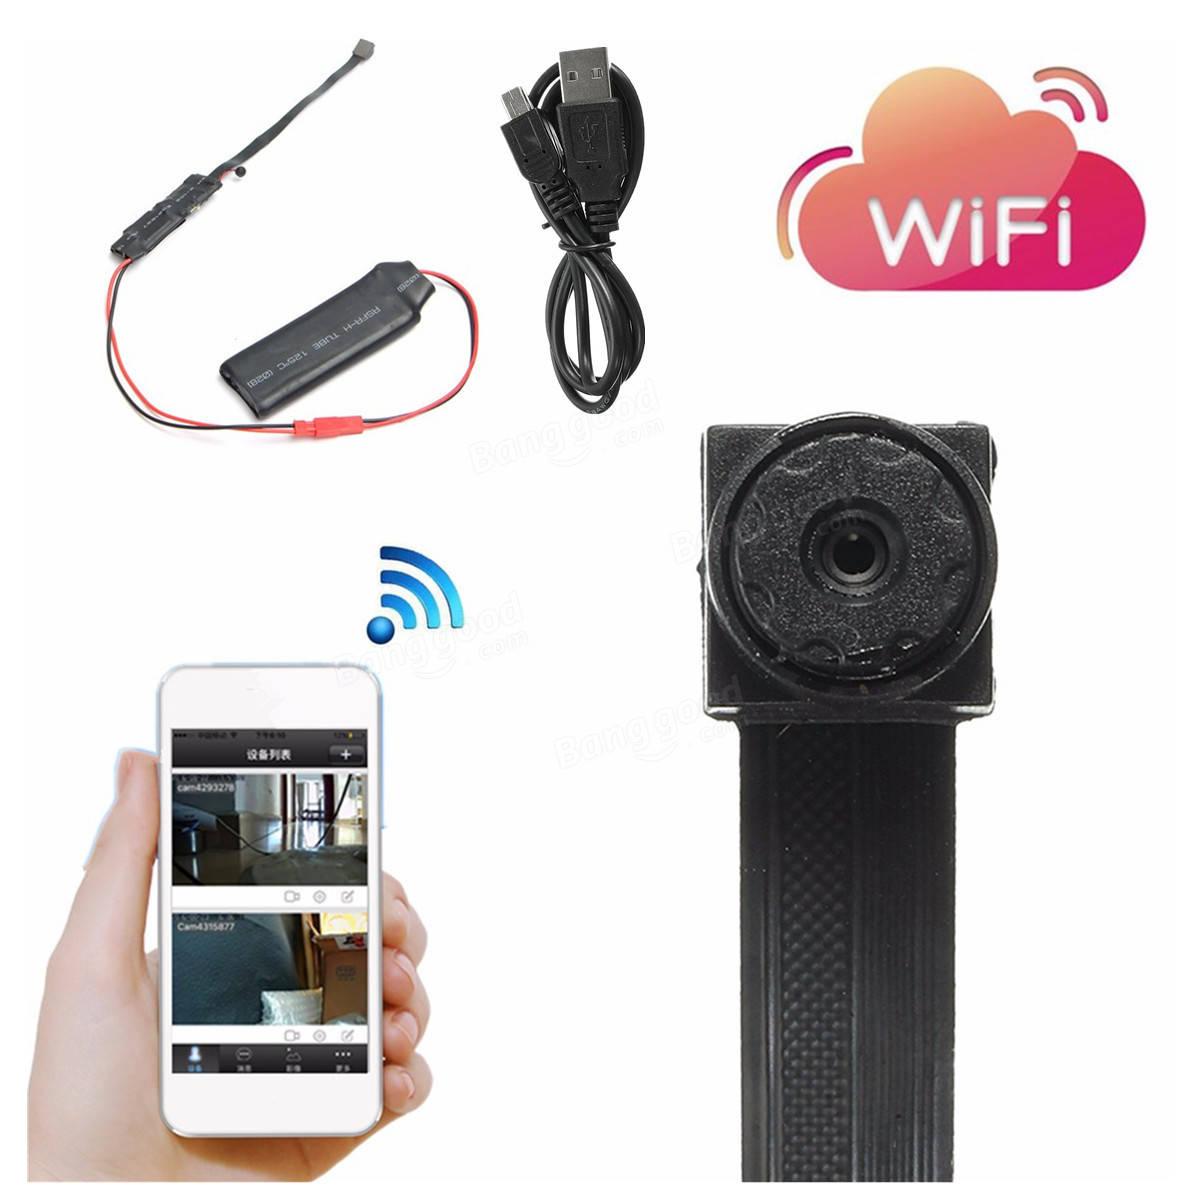 daniu mini wifi module camera cctv ip wireless. Black Bedroom Furniture Sets. Home Design Ideas